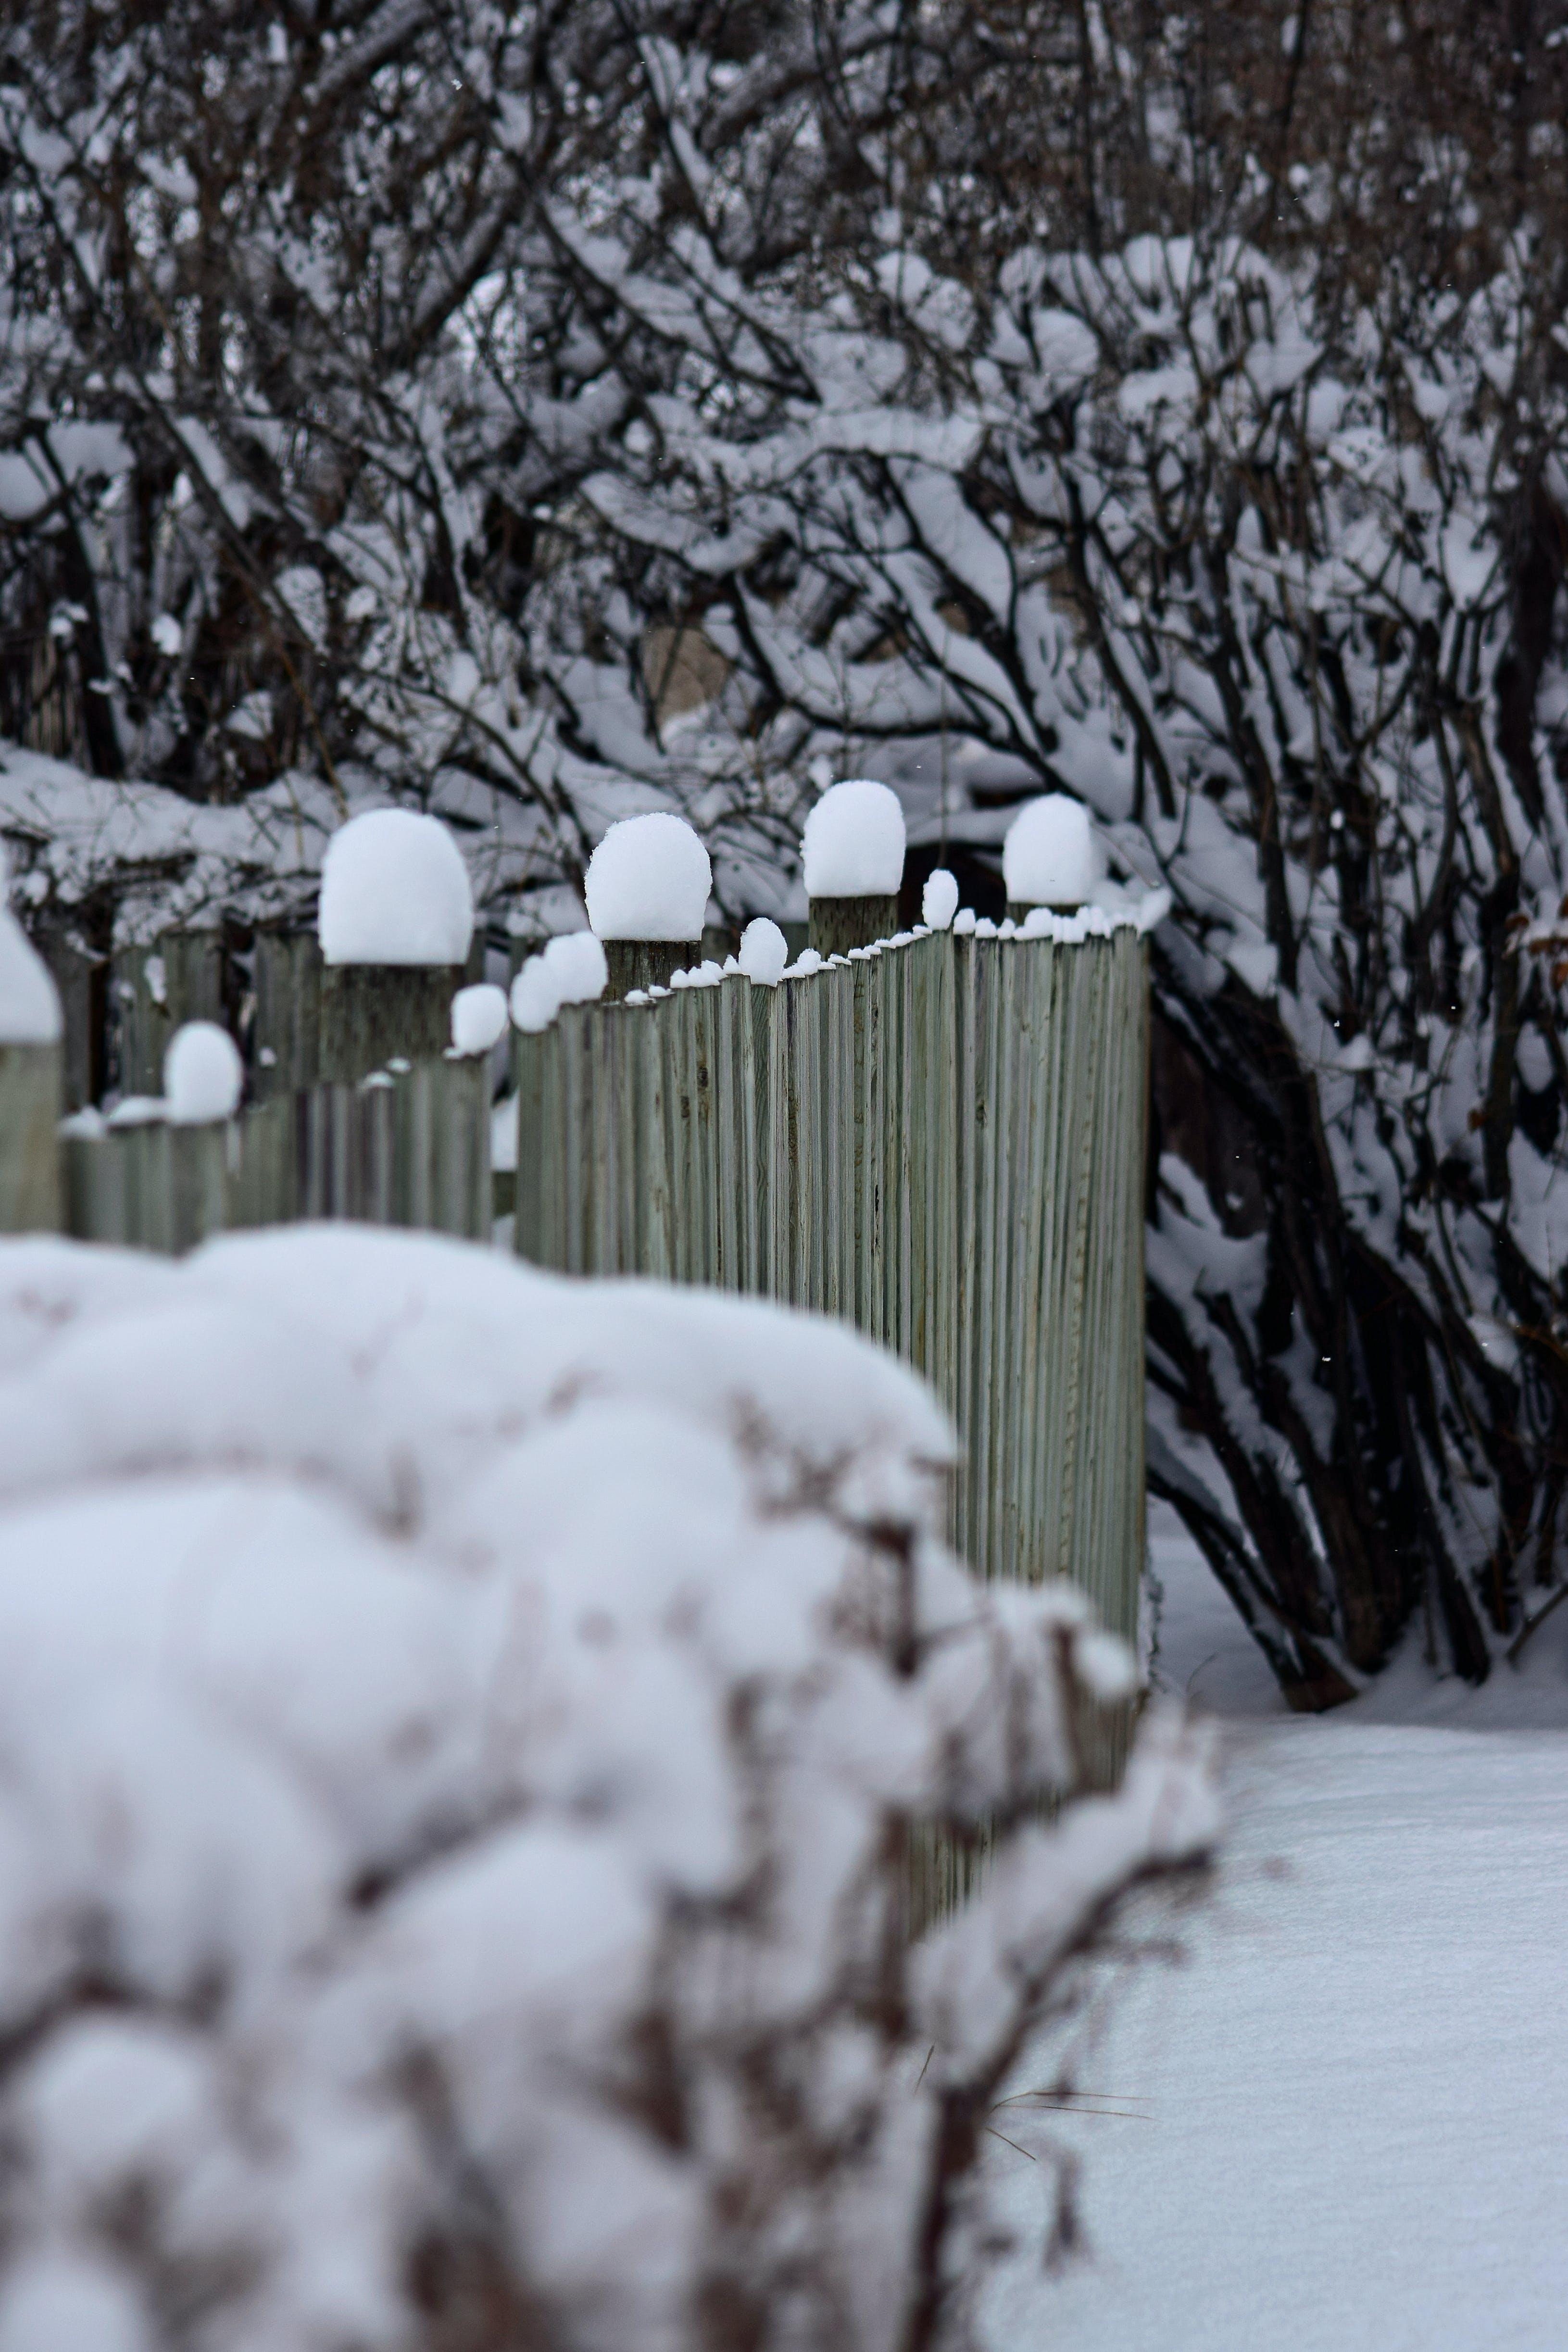 fægte, hegn, sne